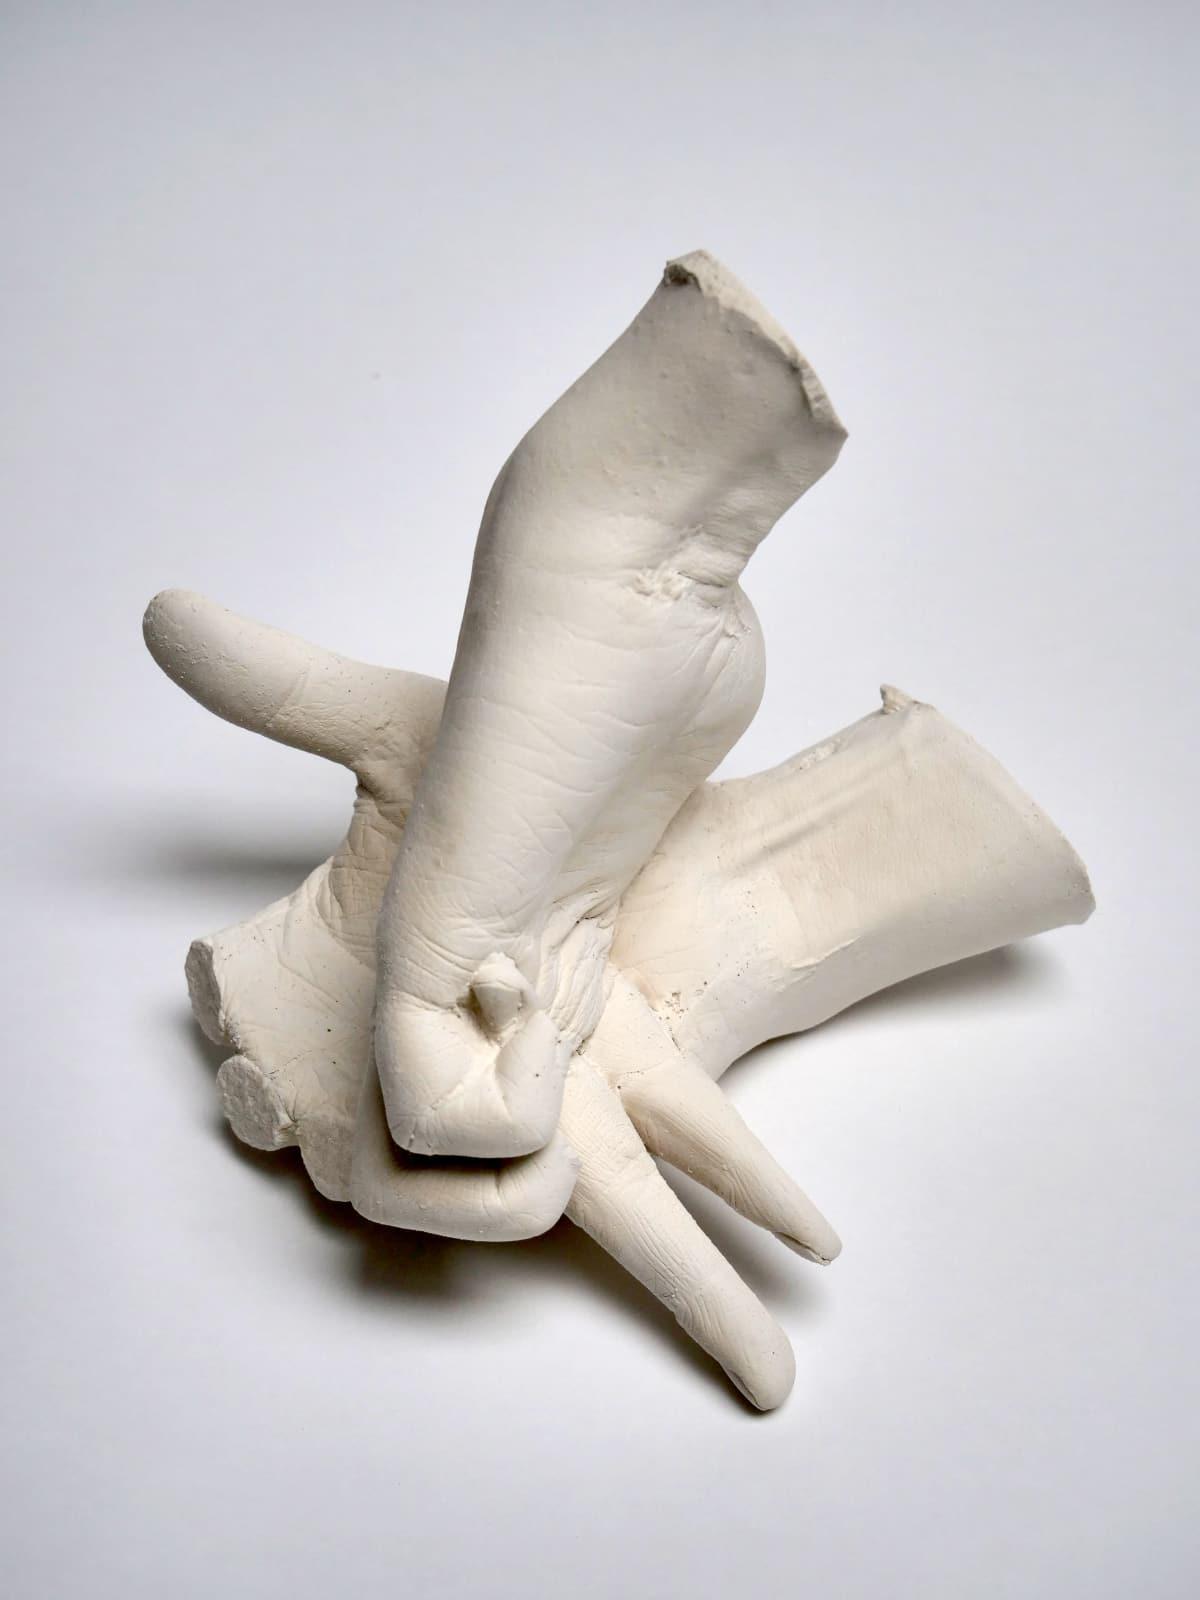 Marcus Coates, Extinct Animals (Yangtze River Dolphin), 2018